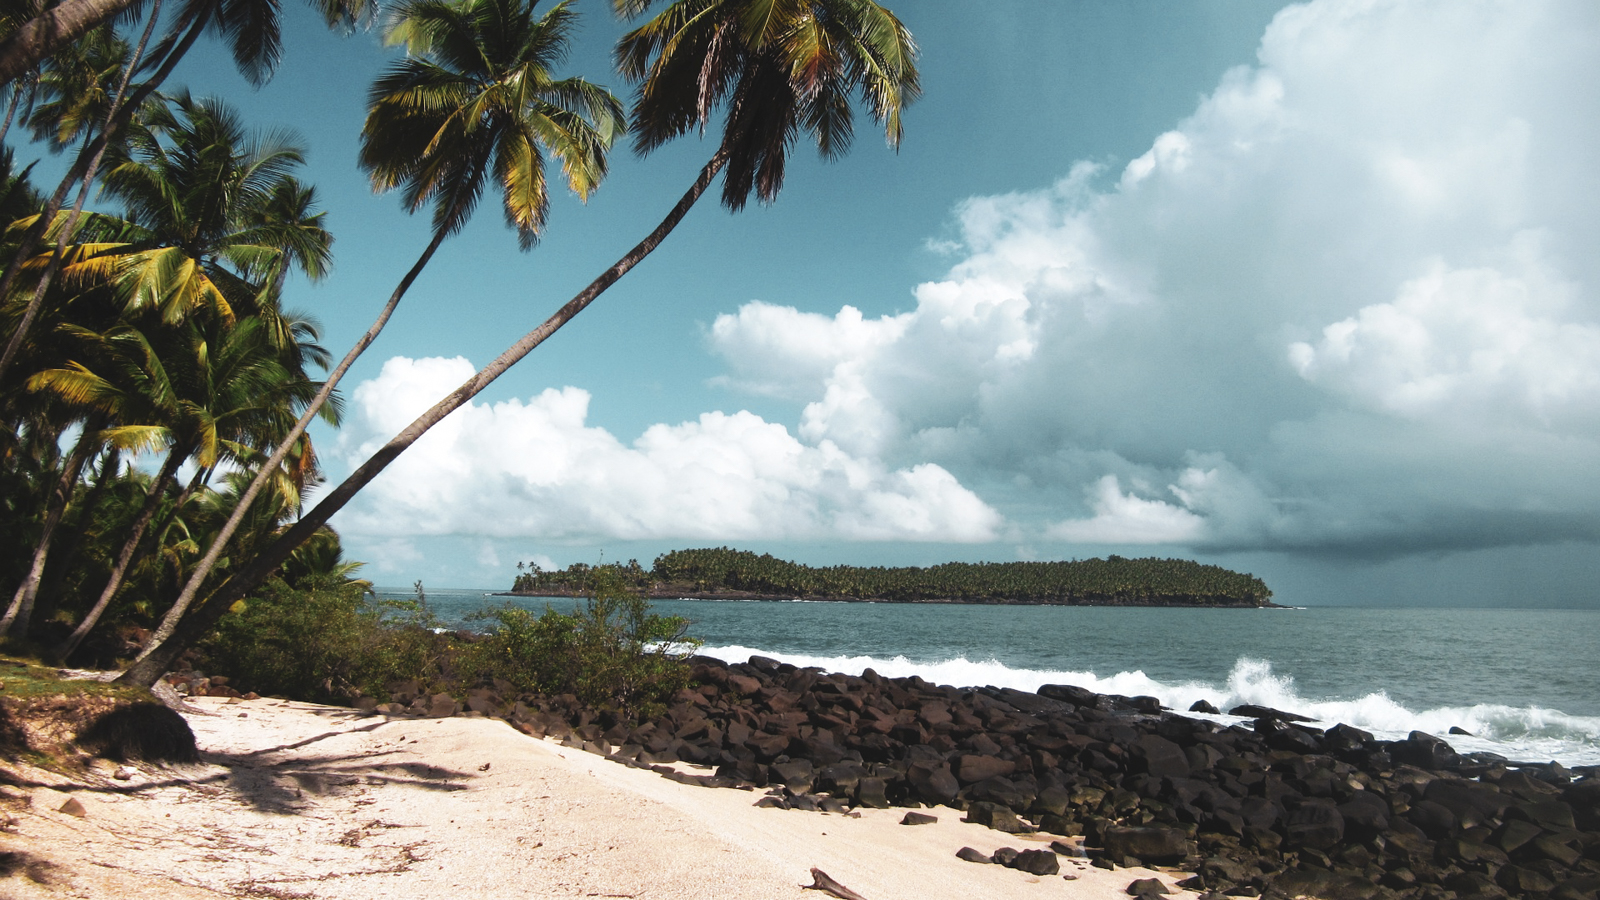 Iles de Salut vacances en Guyane